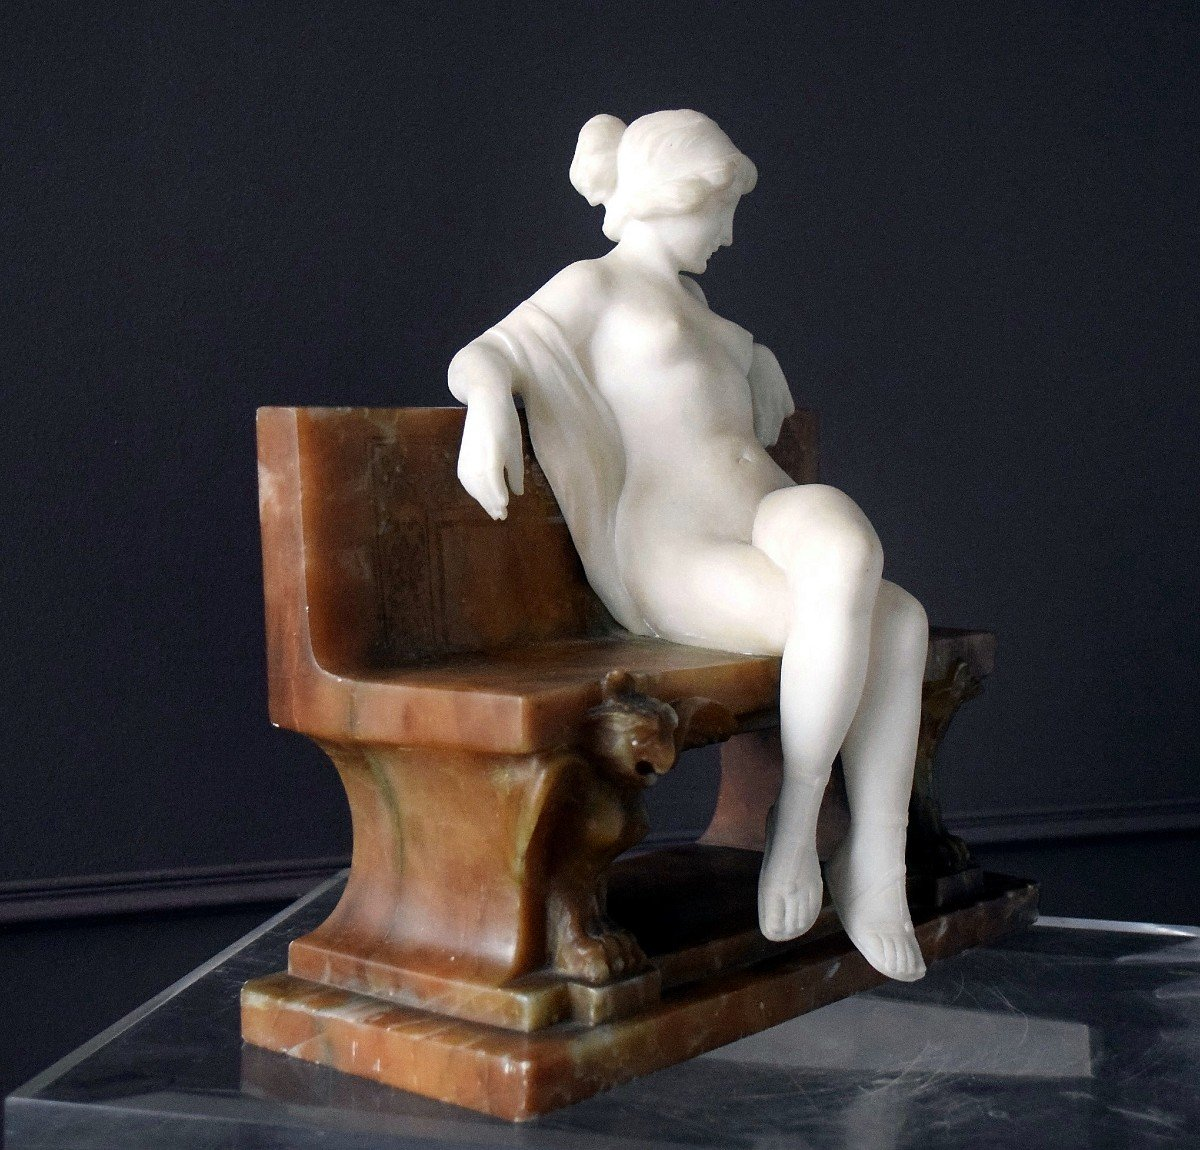 Nymph By Ferdinando Vichi Carrara Marble And Alabaster Italy-photo-4